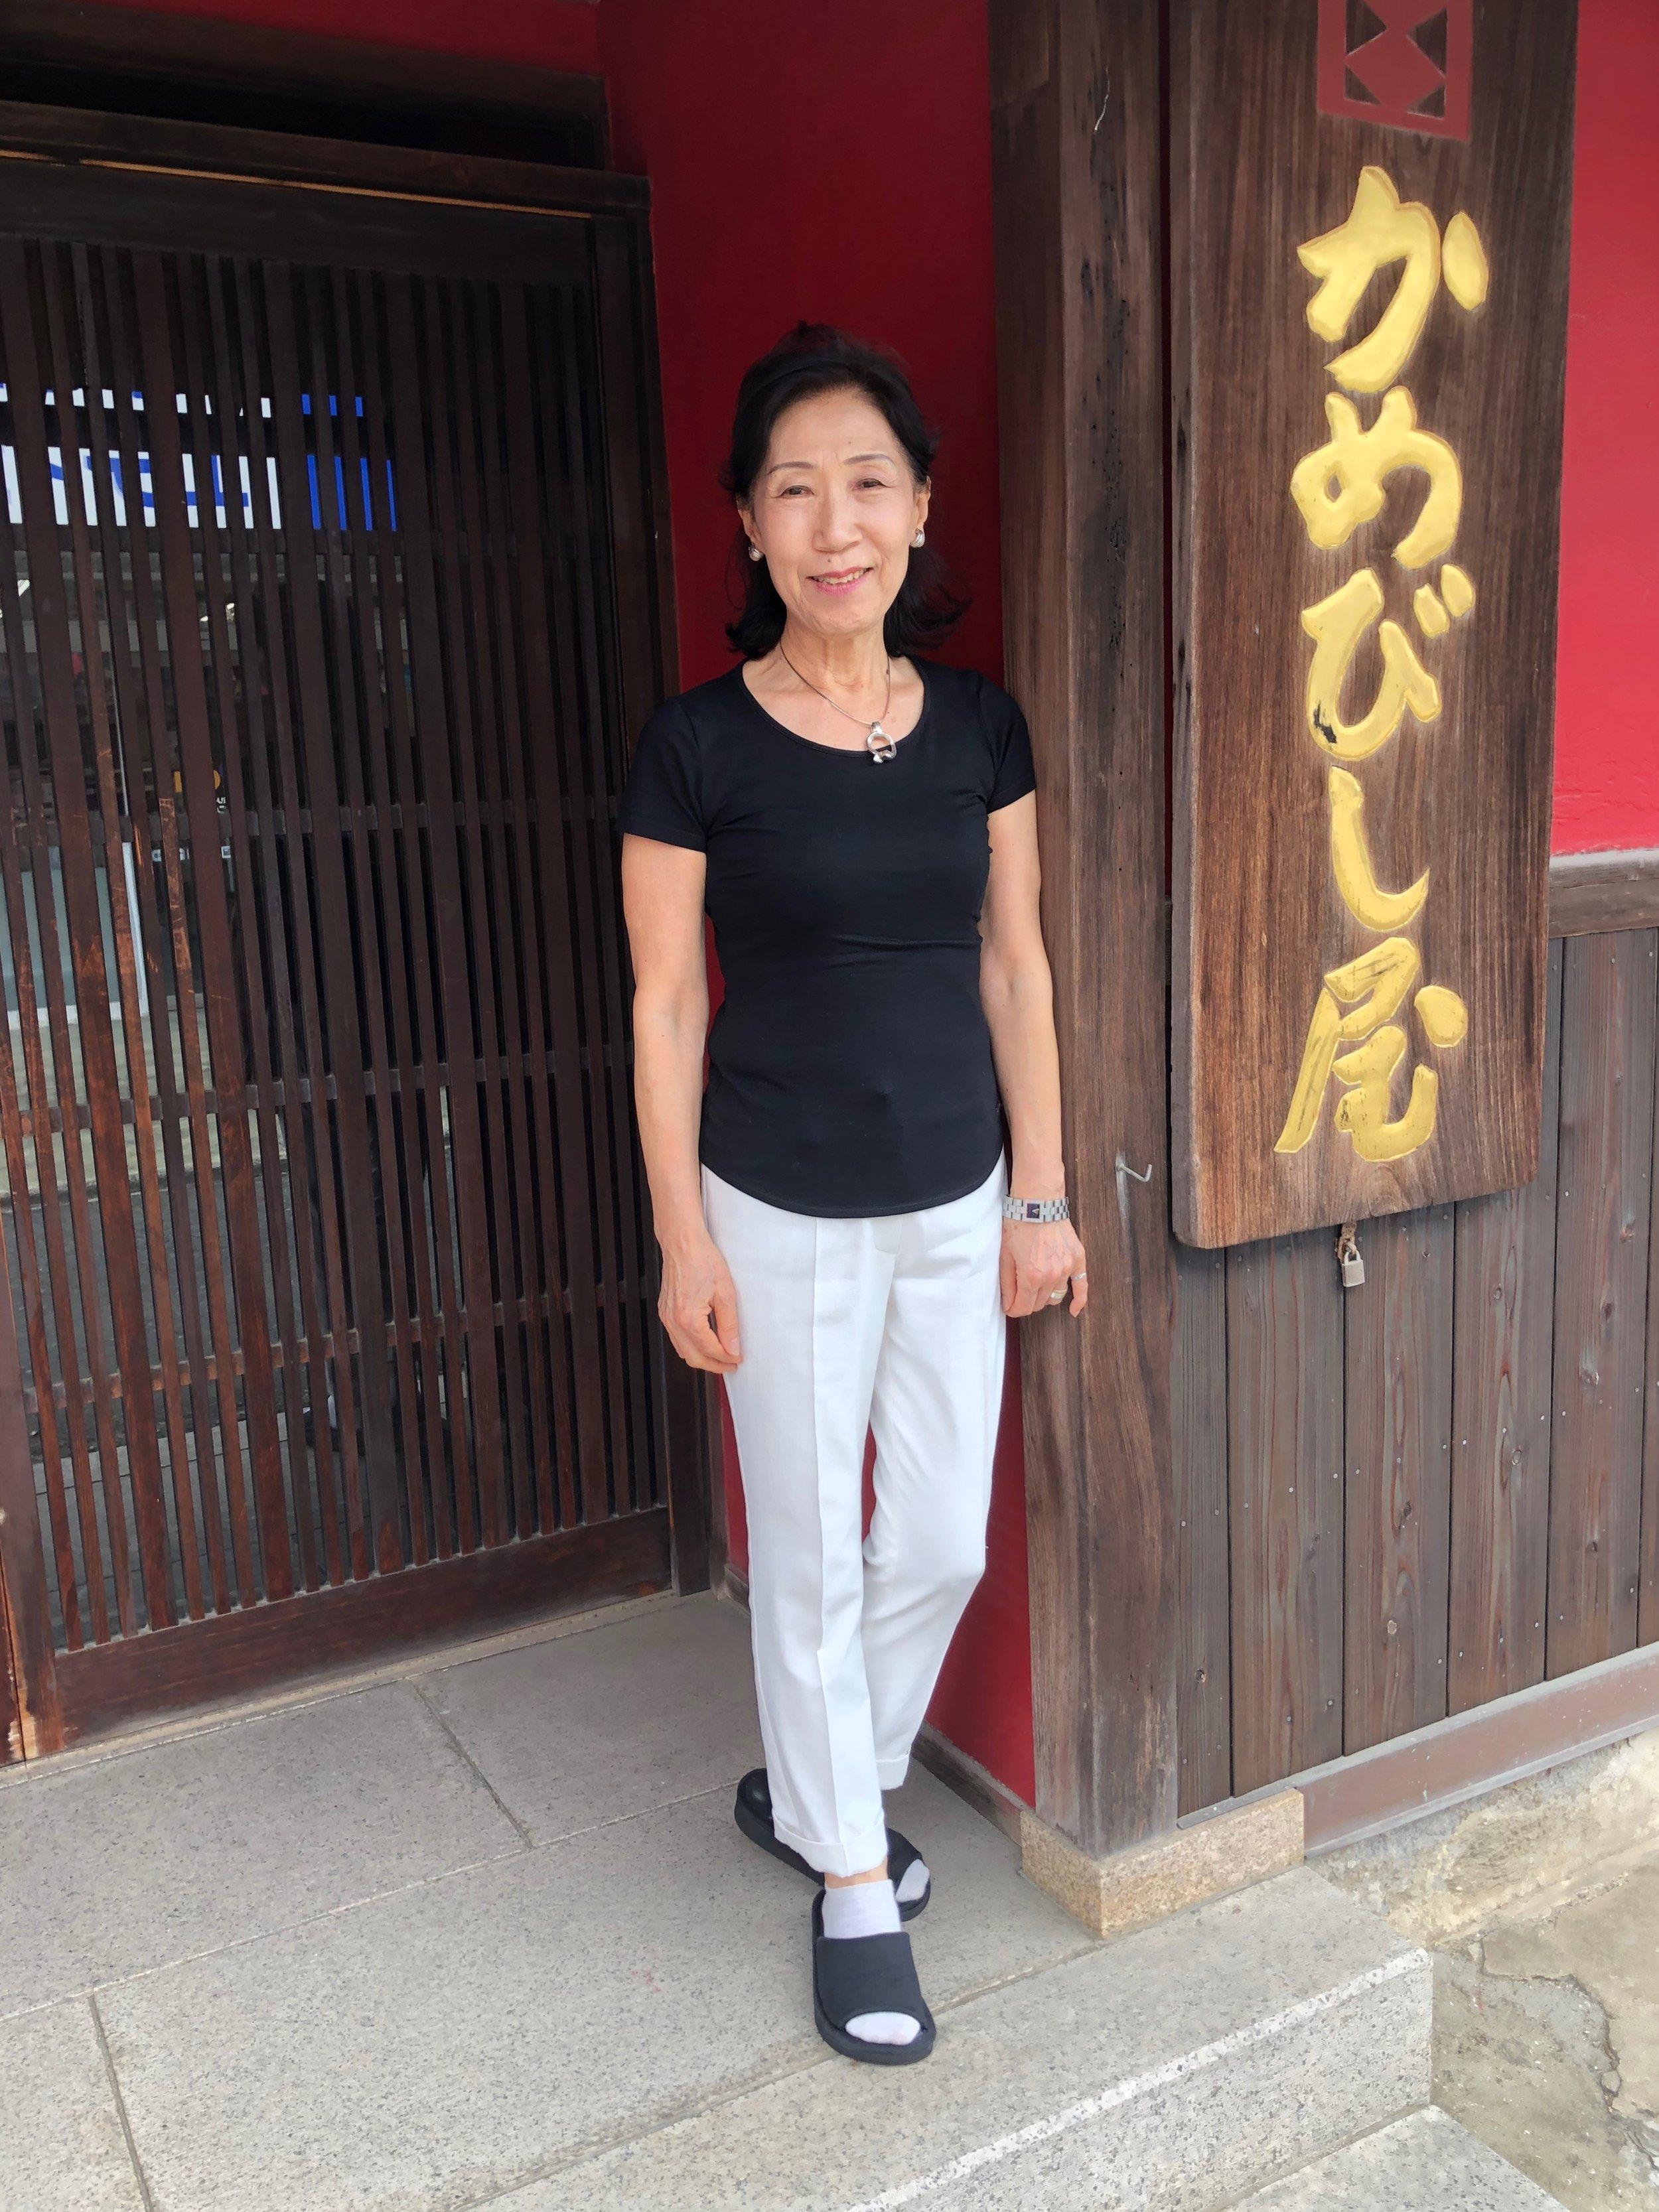 The current head of Kamebishiya, Kanae Okada, is the 17th generation member of the Okada family to run the soy sauce brewery.